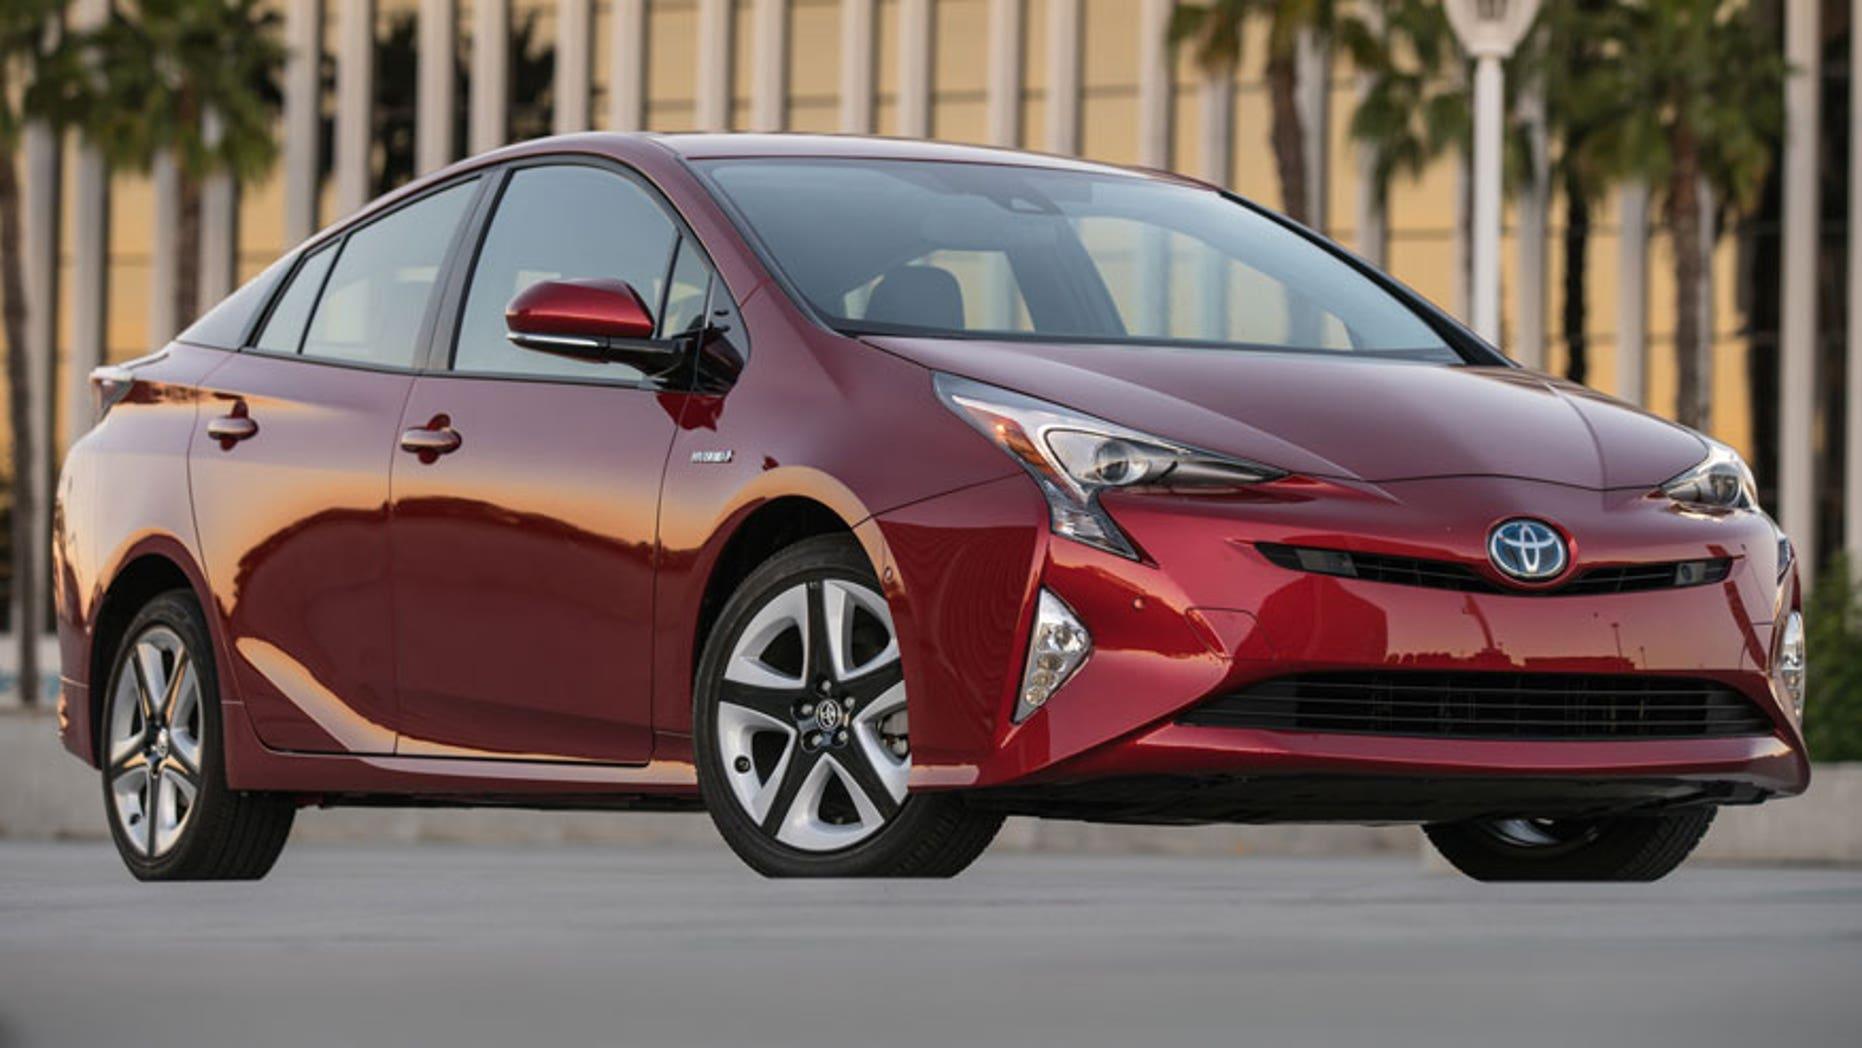 Toyota Recalls 340 000 Prius Hybrid Cars For Faulty Brakes